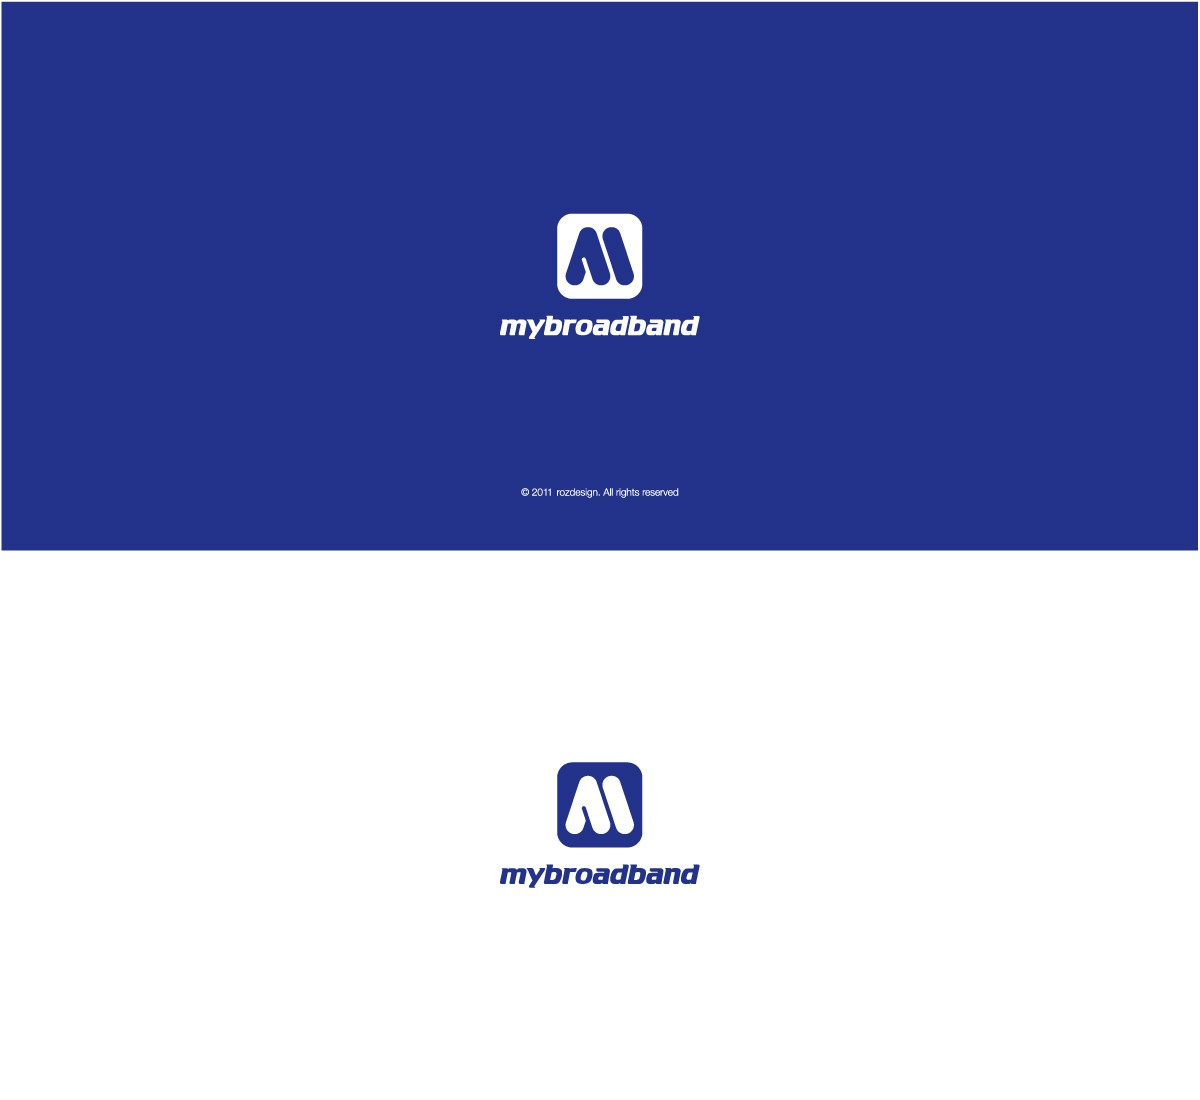 logo for MyBroadband